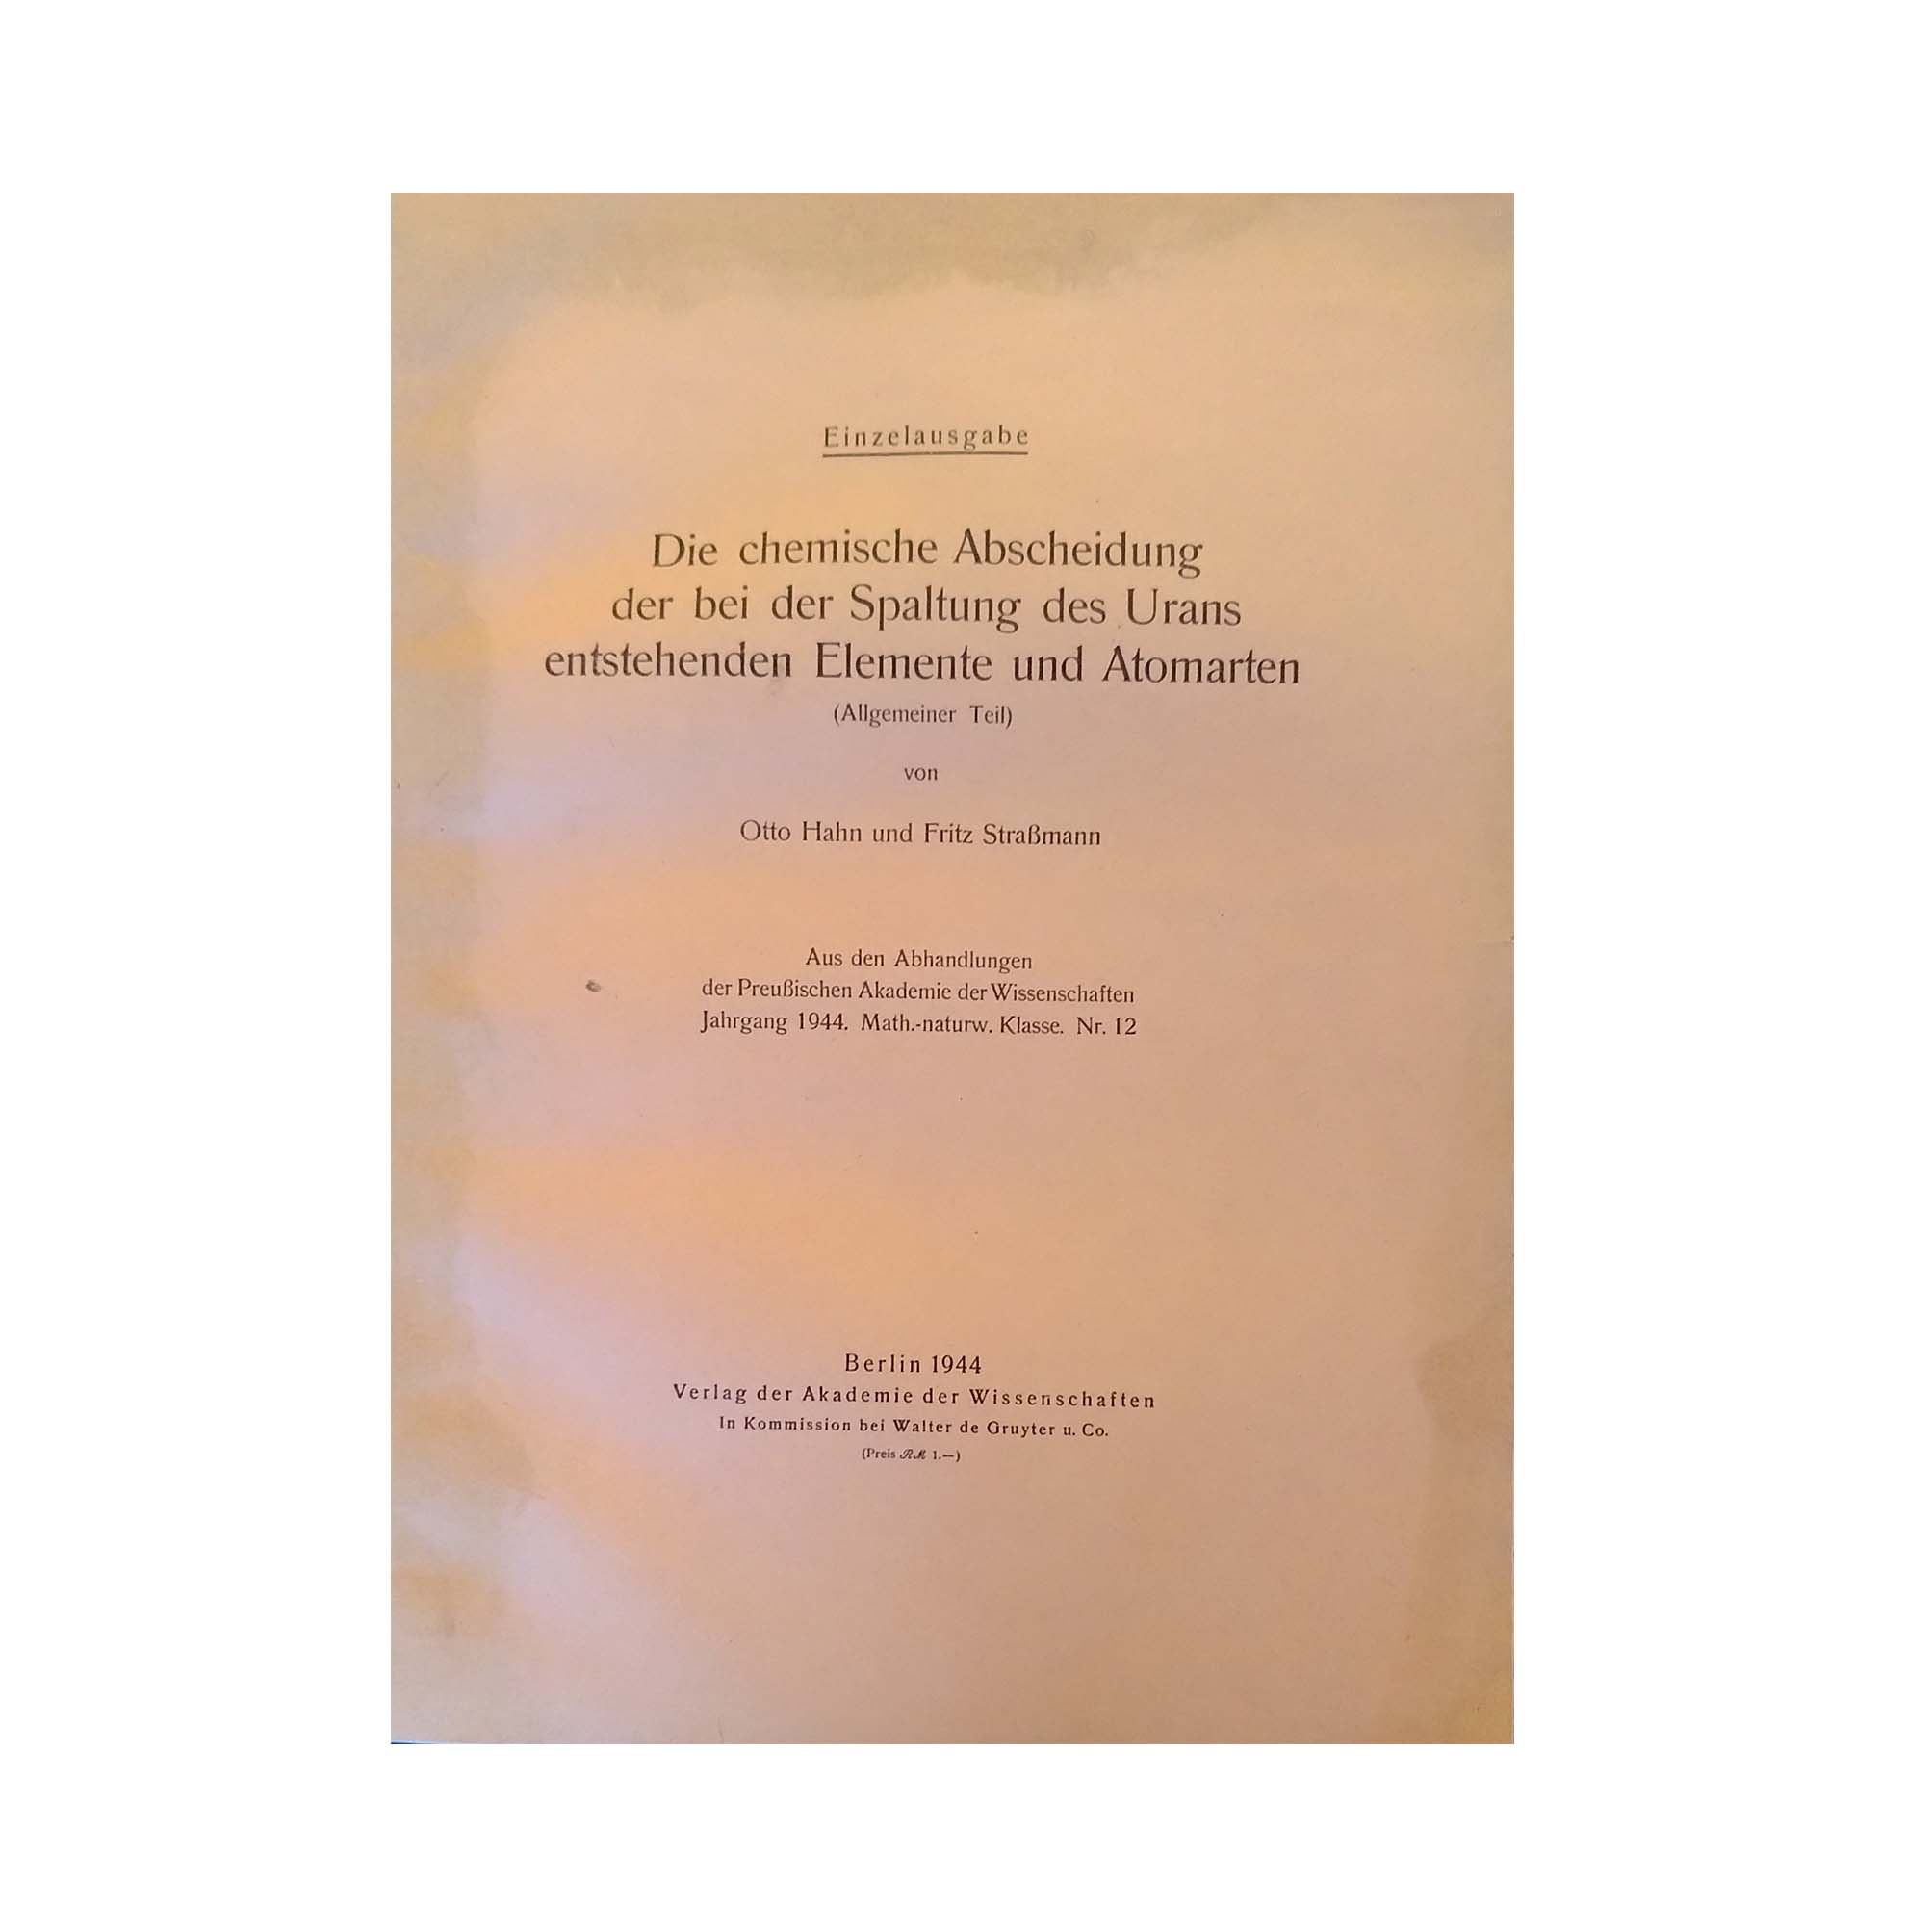 5842K-Hahn-Strassmann-Nucelar-Fission-1944-Separate-Printing-Cover-recto-A-N.jpg